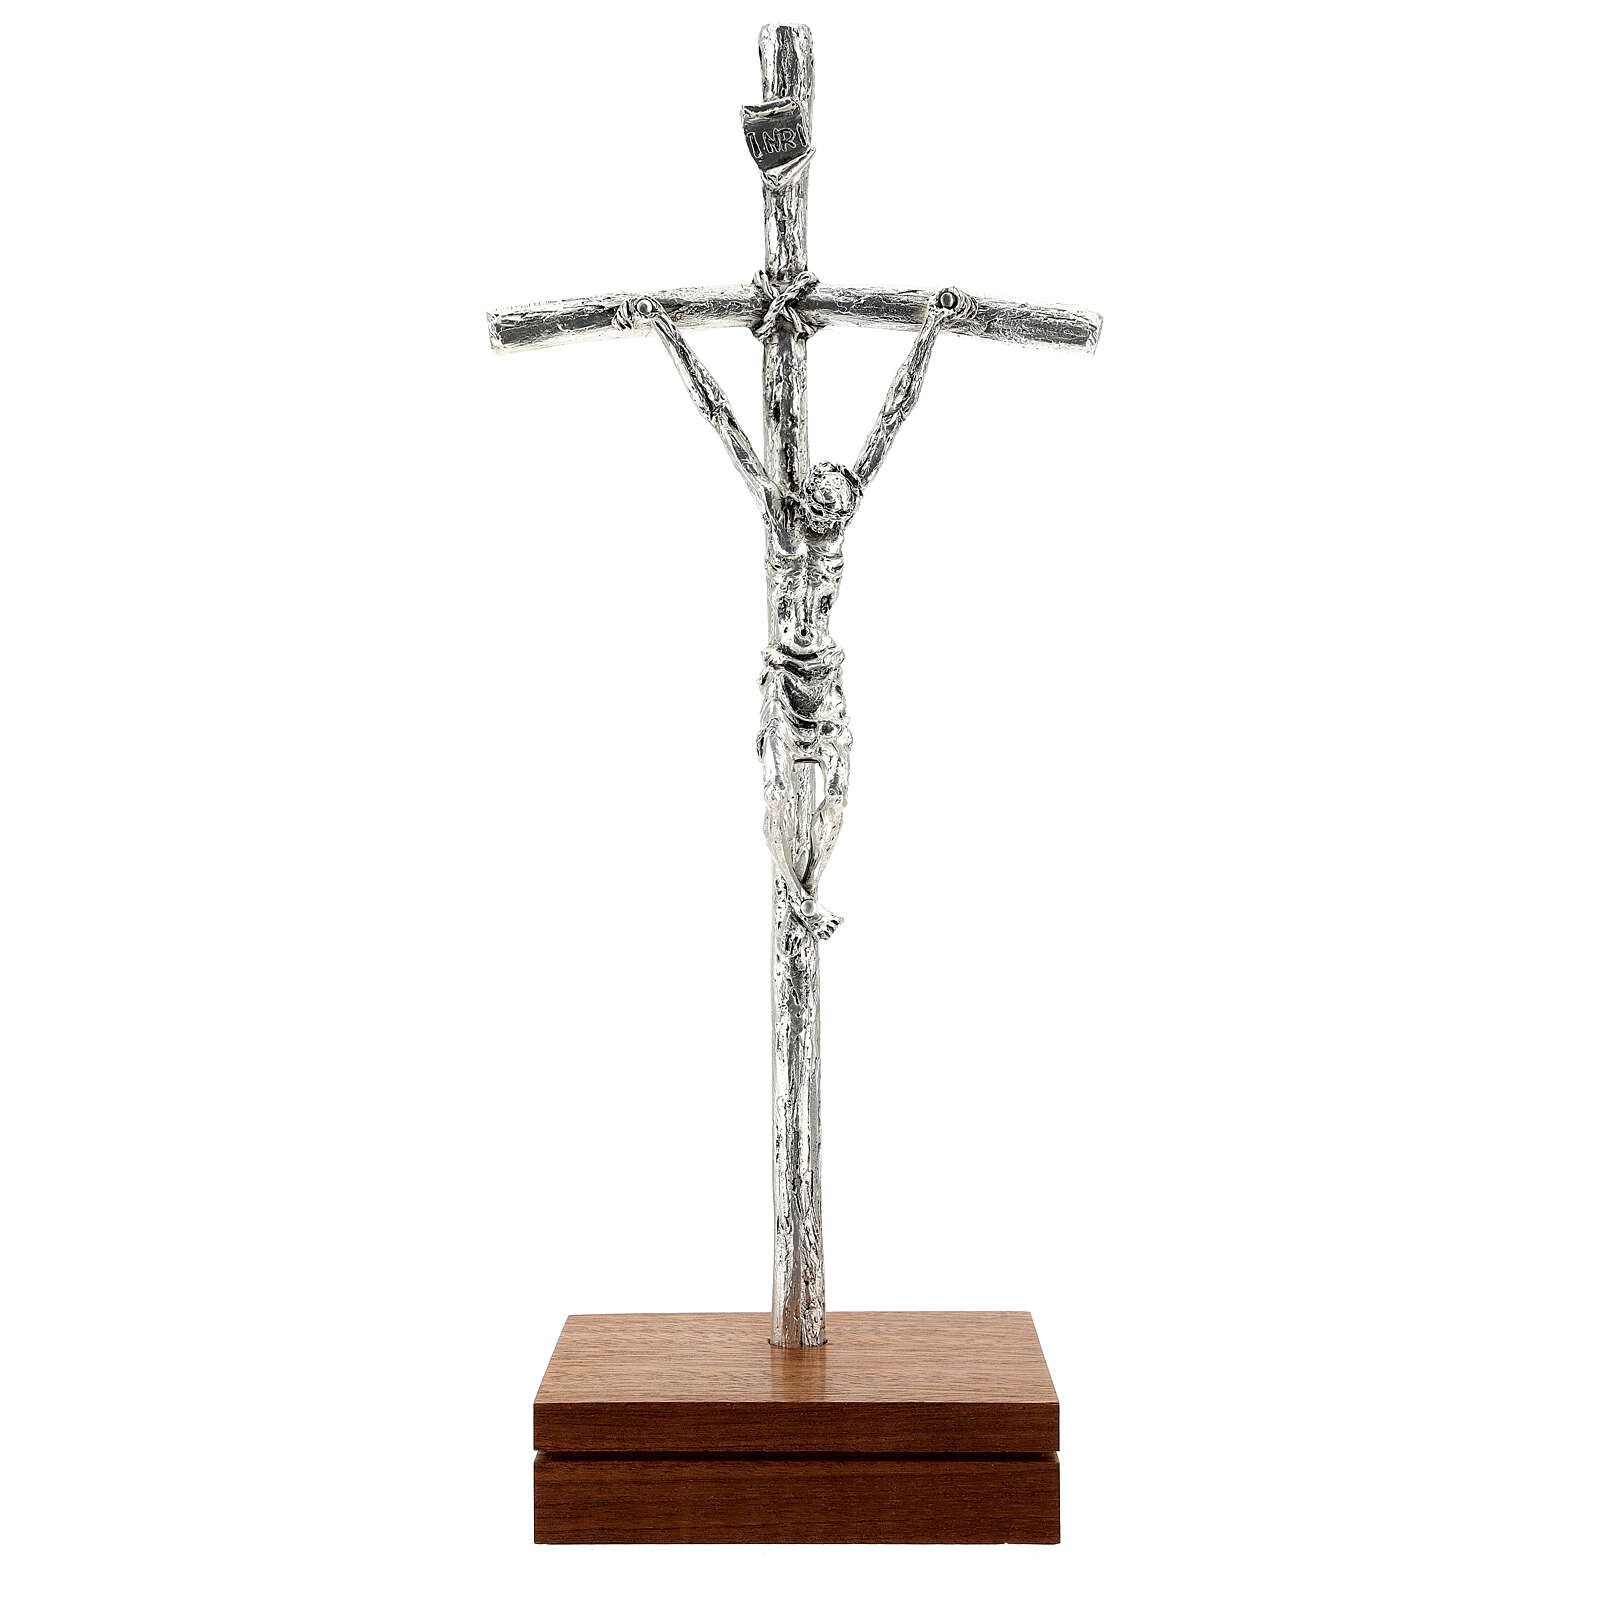 Kruzifix Pastoral Kreuz Johannes Paul II silbrigen Metall 4